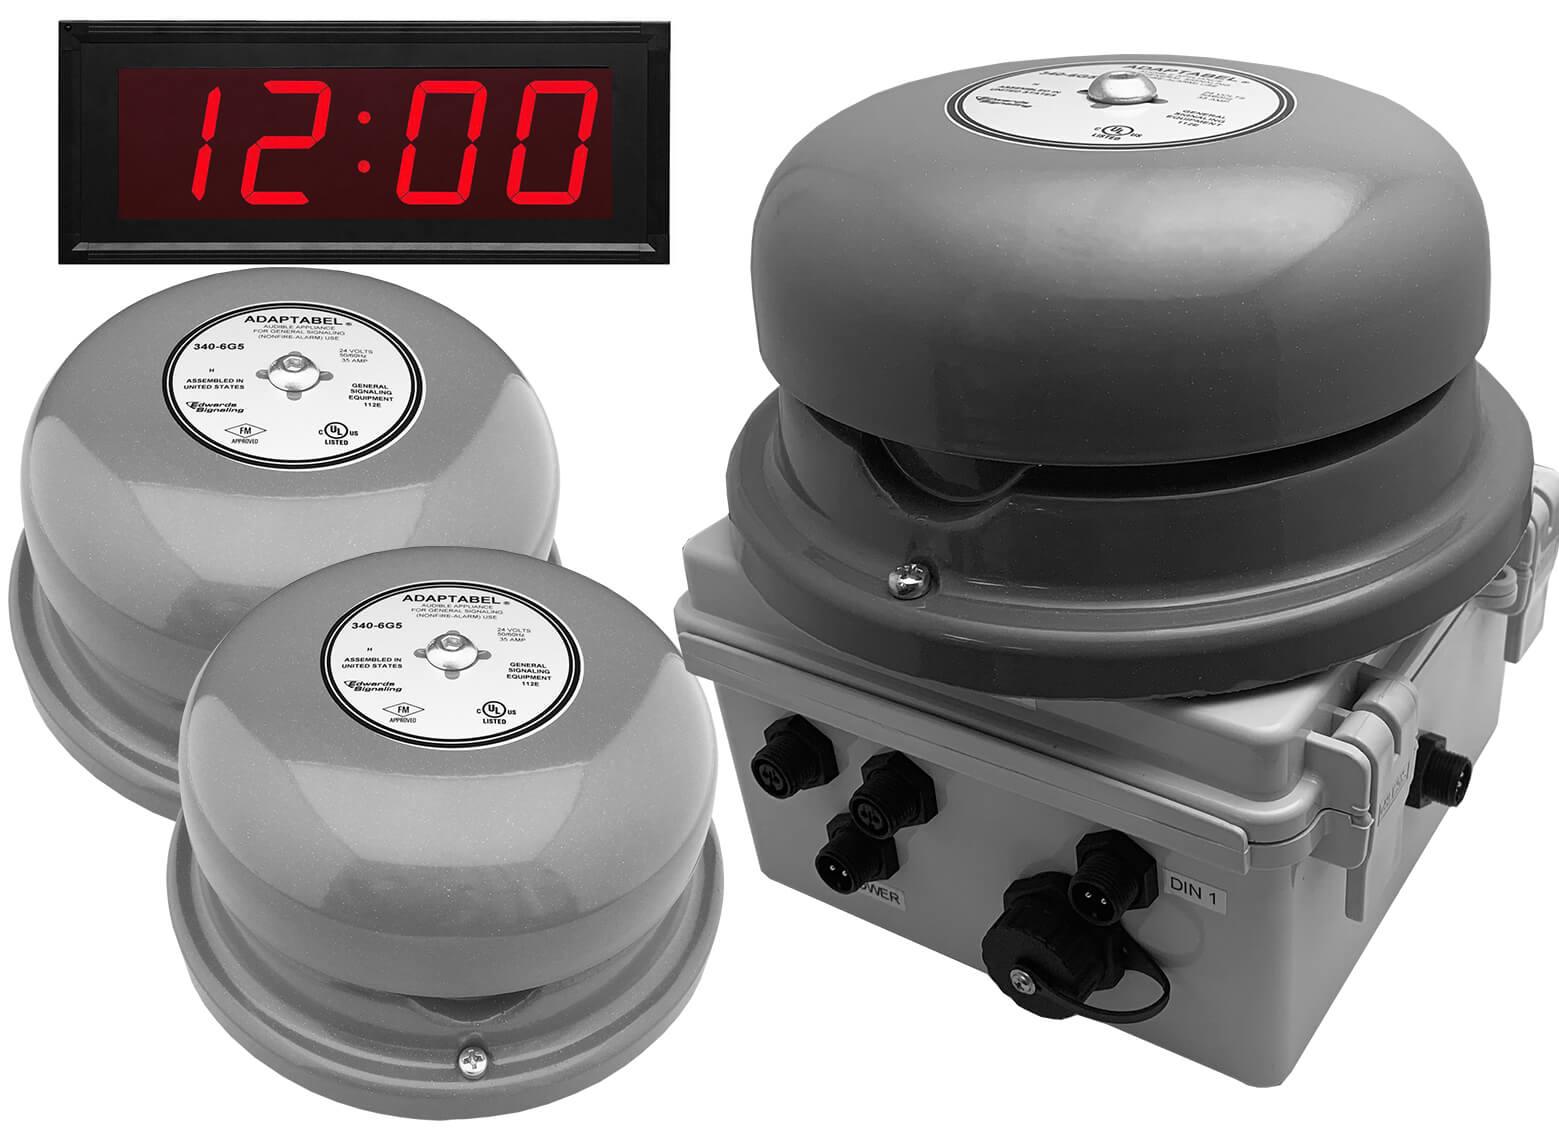 Netbell-KL-E2M-C Network All-in-One Extra Loud Break Bell Clock System (3 Bells System)